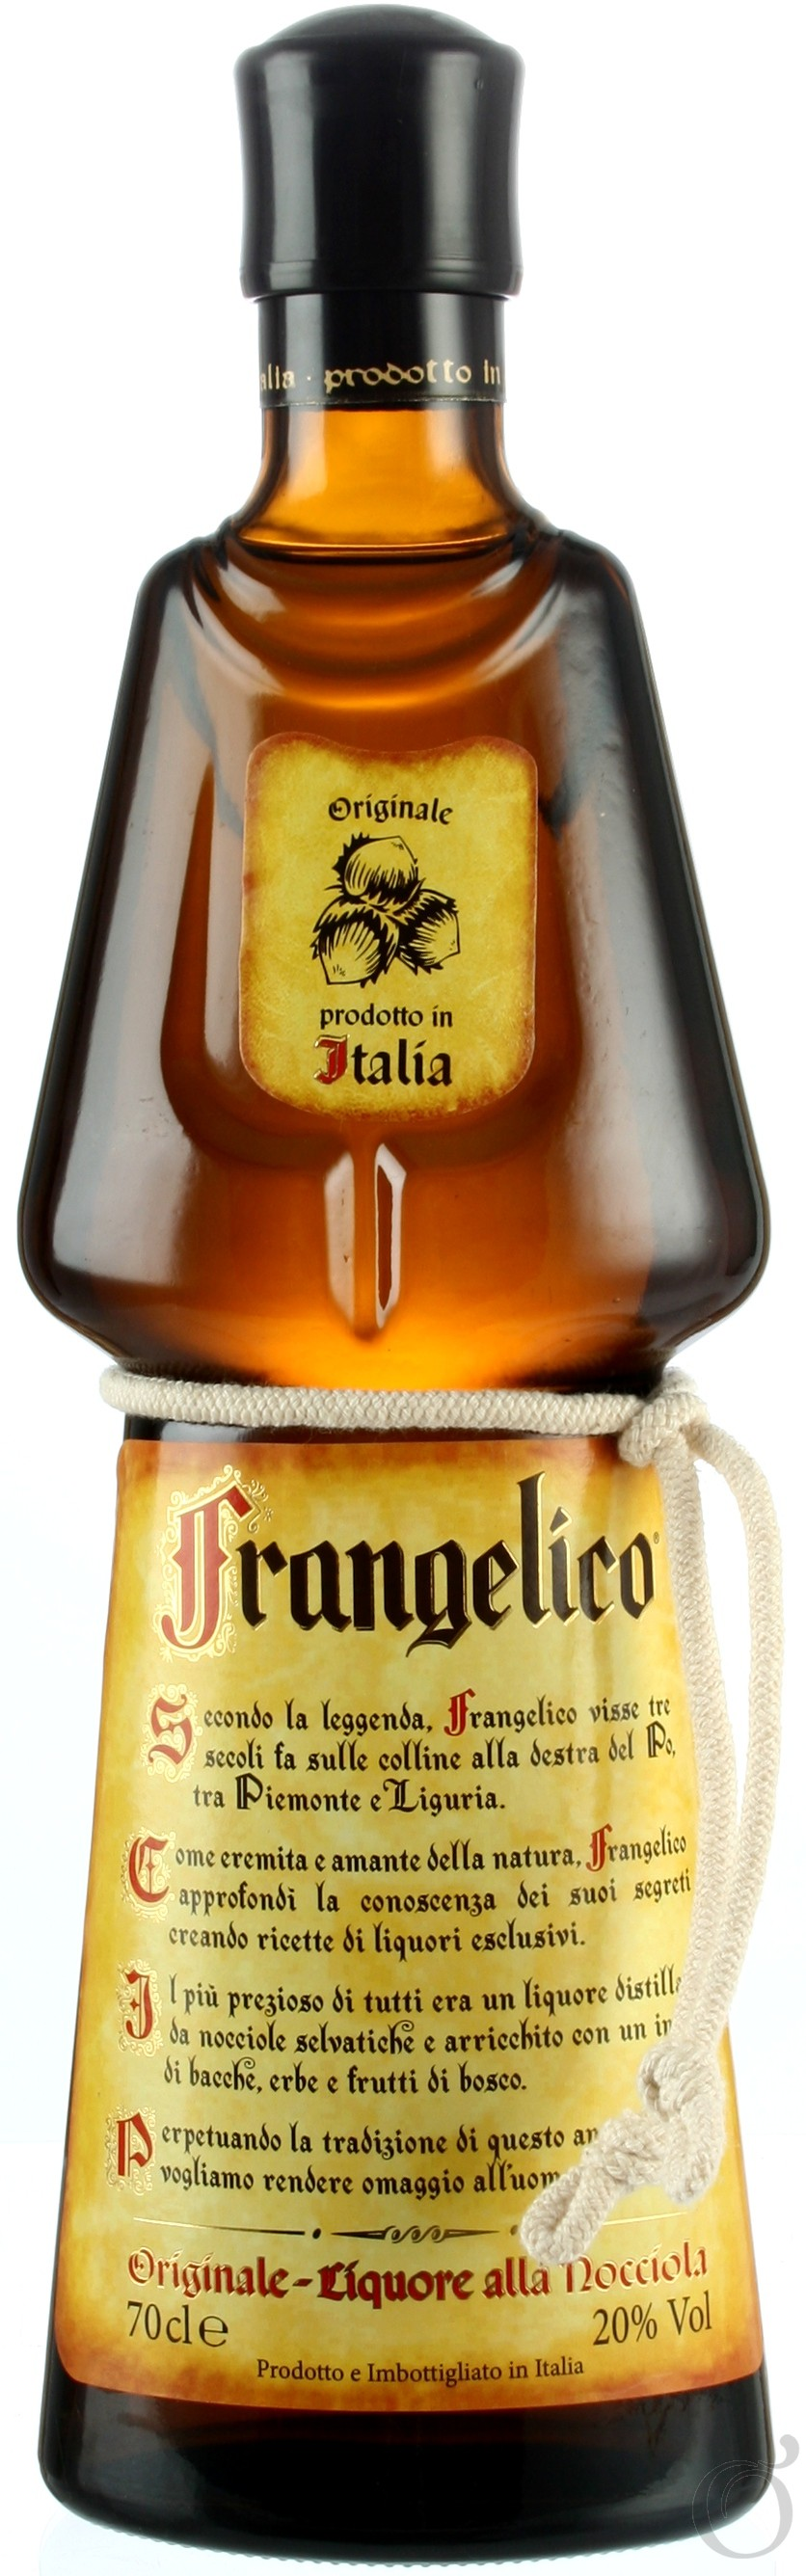 Frangelico bottle